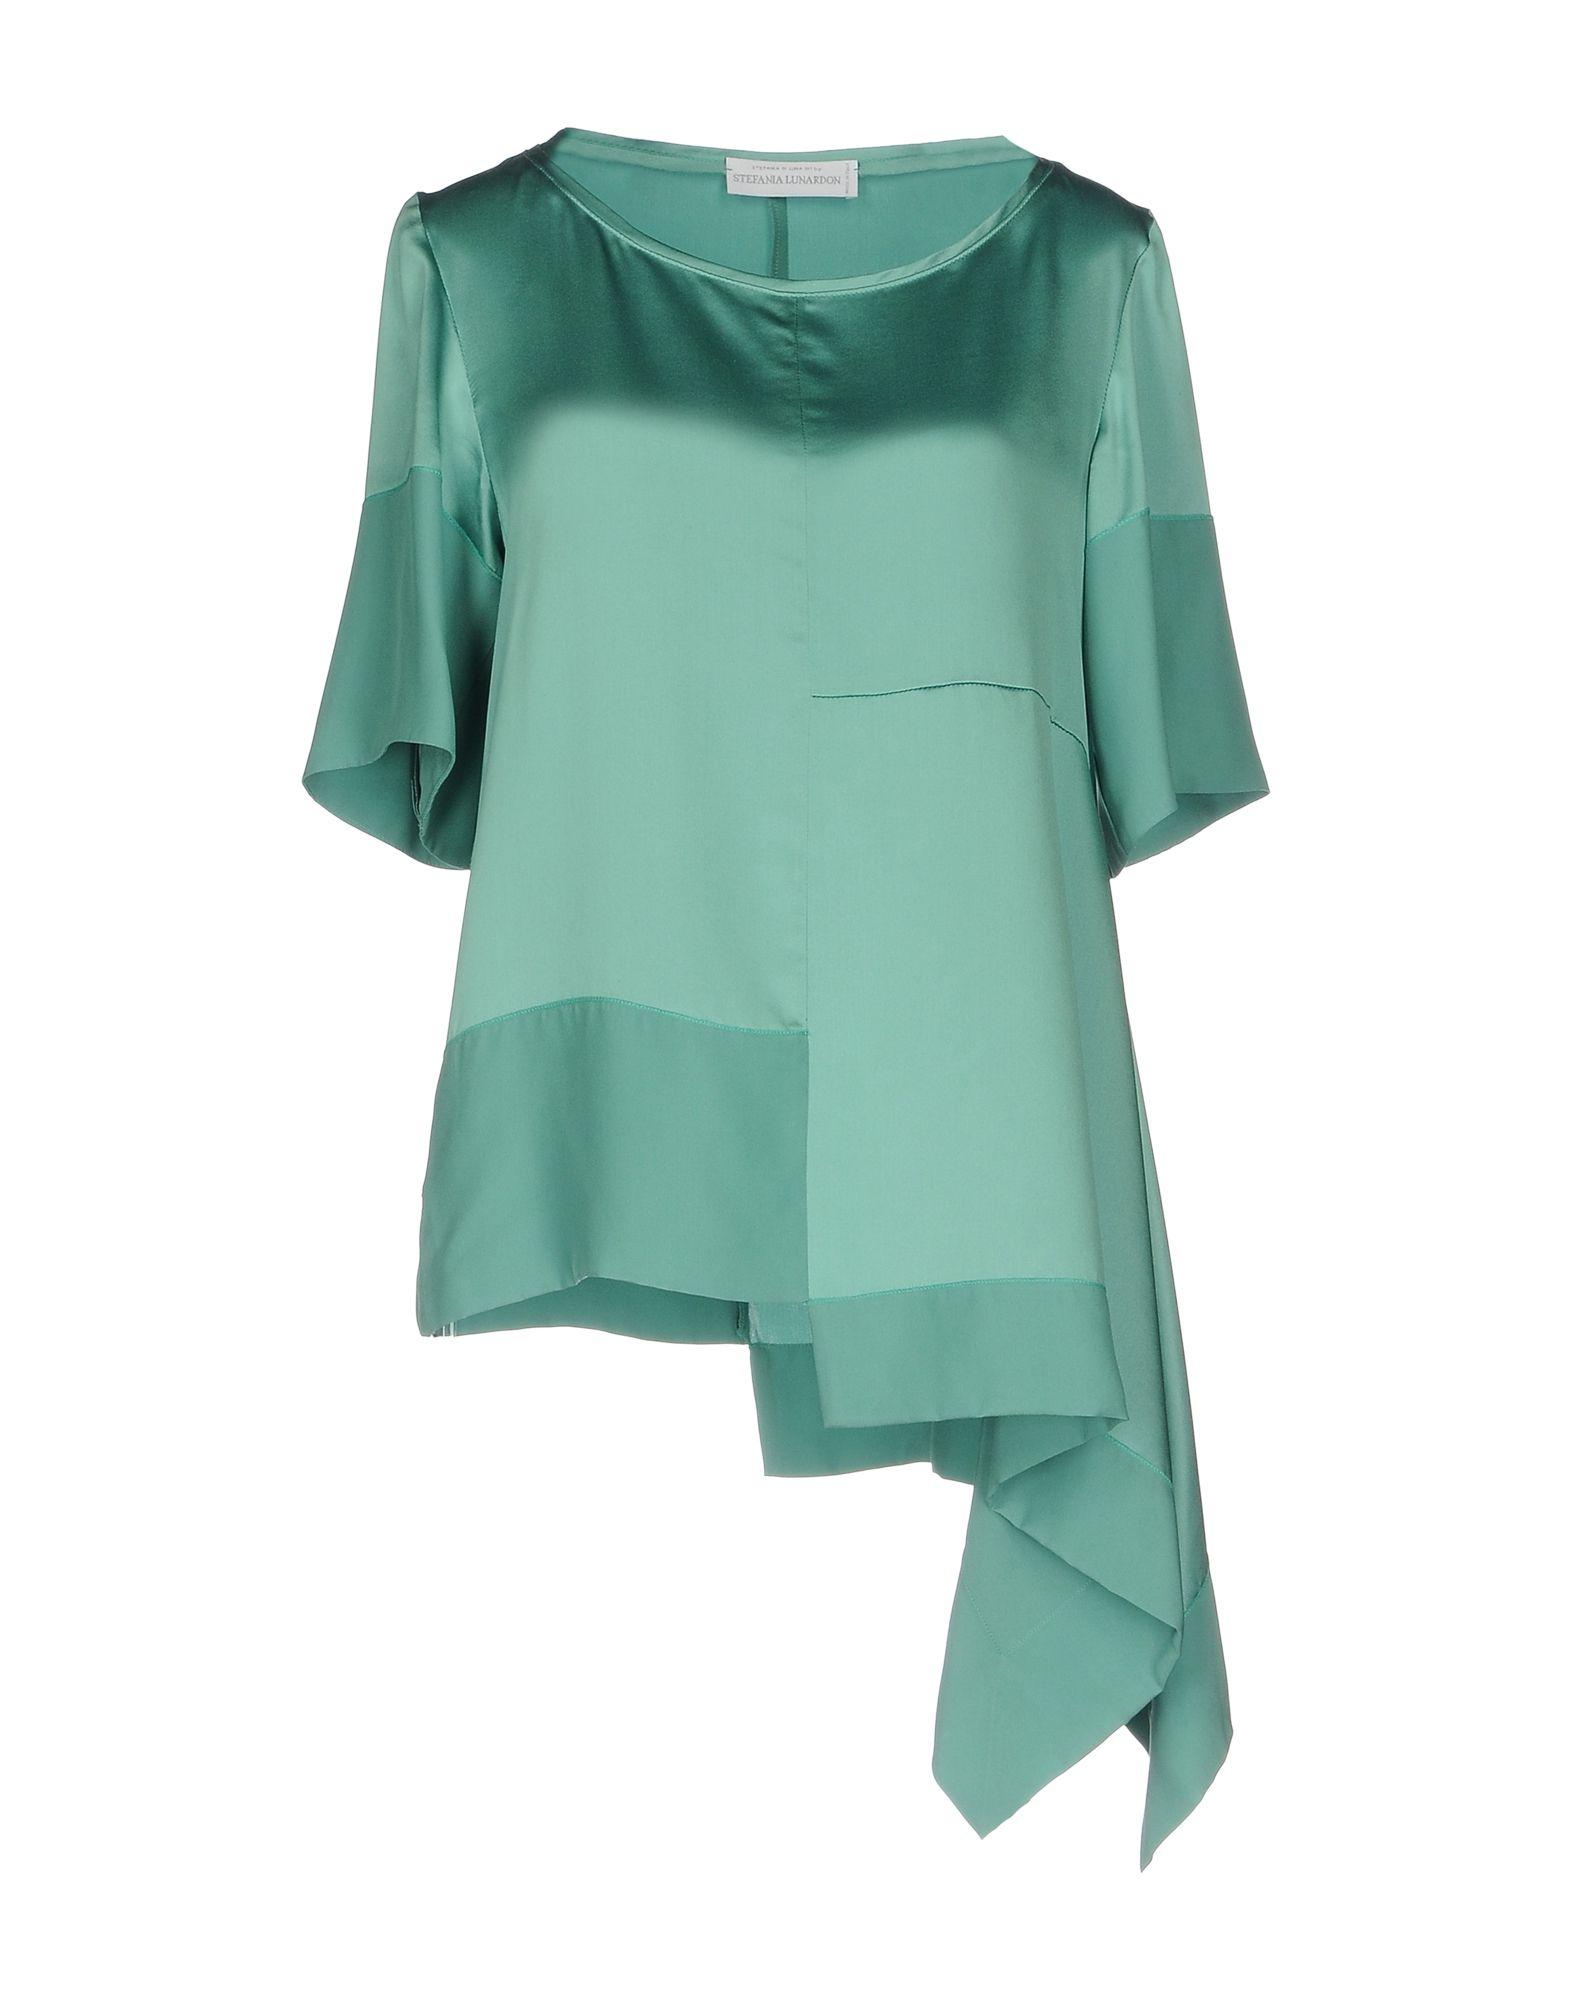 STEFANIA LUNARDON Damen Bluse Farbe Grün Größe 4